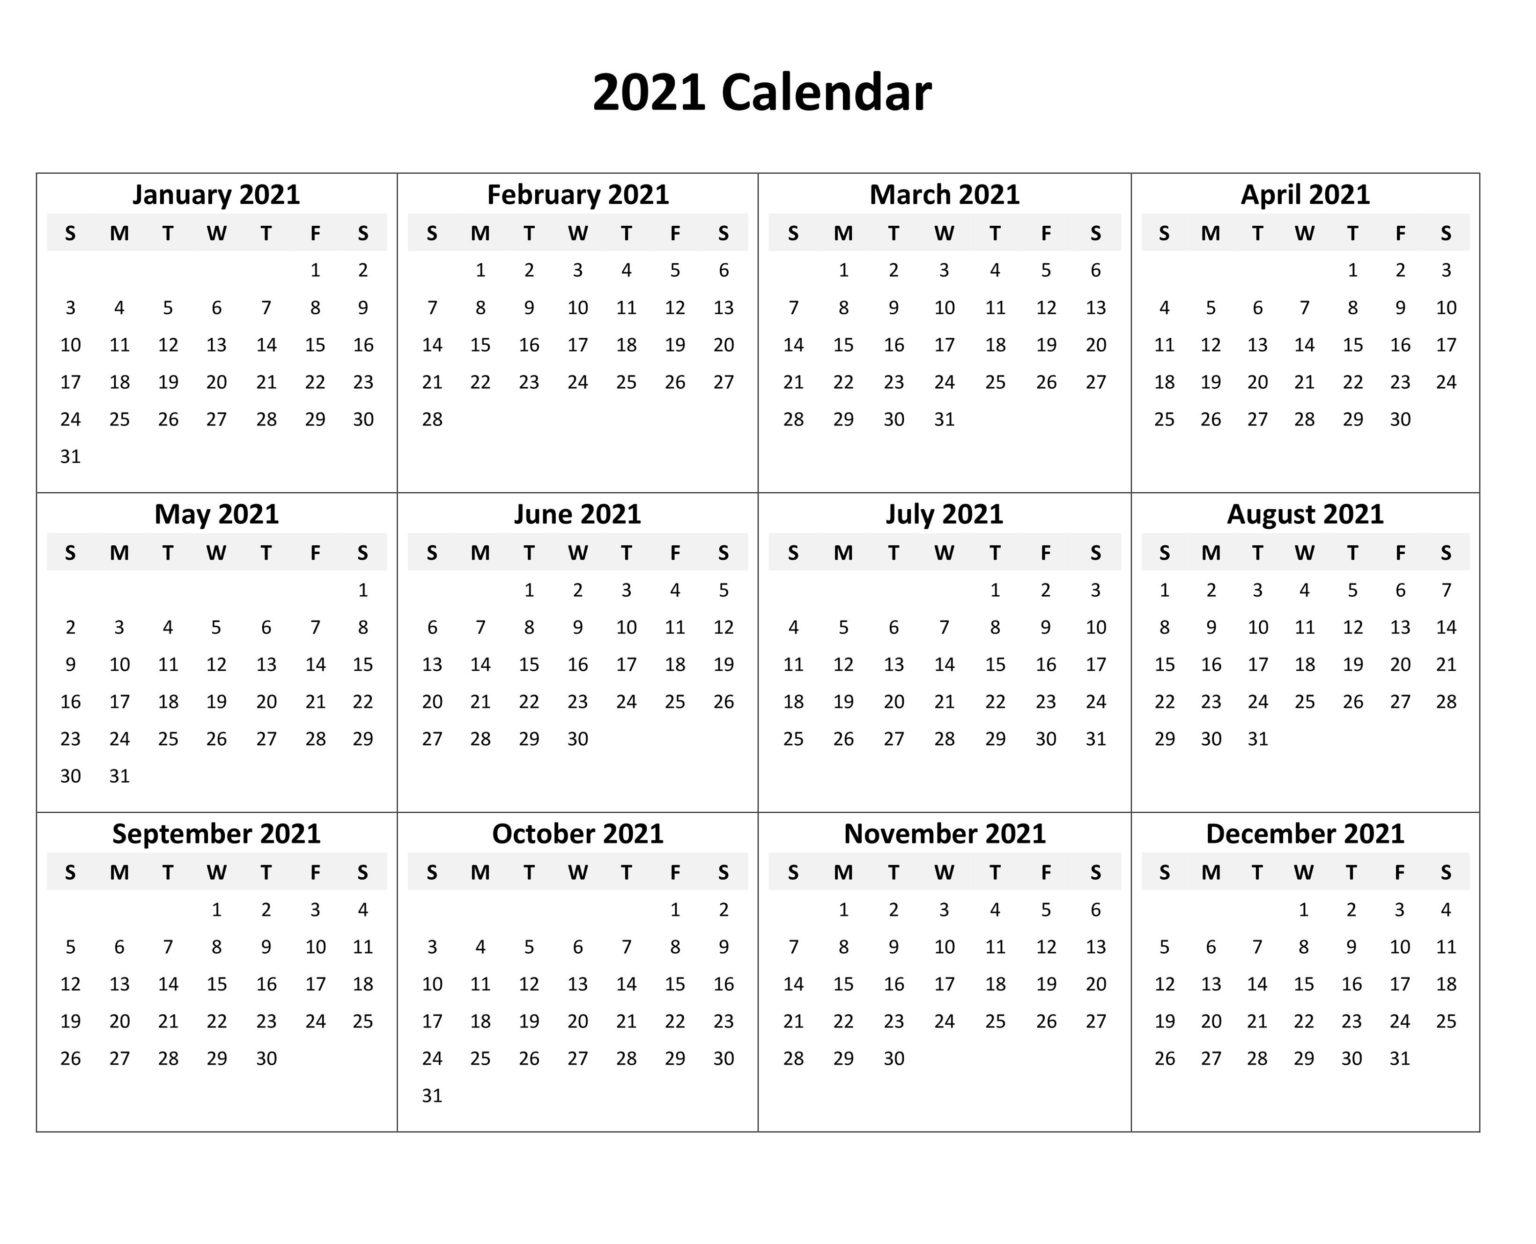 Free Blank 2021 Calendar Printable